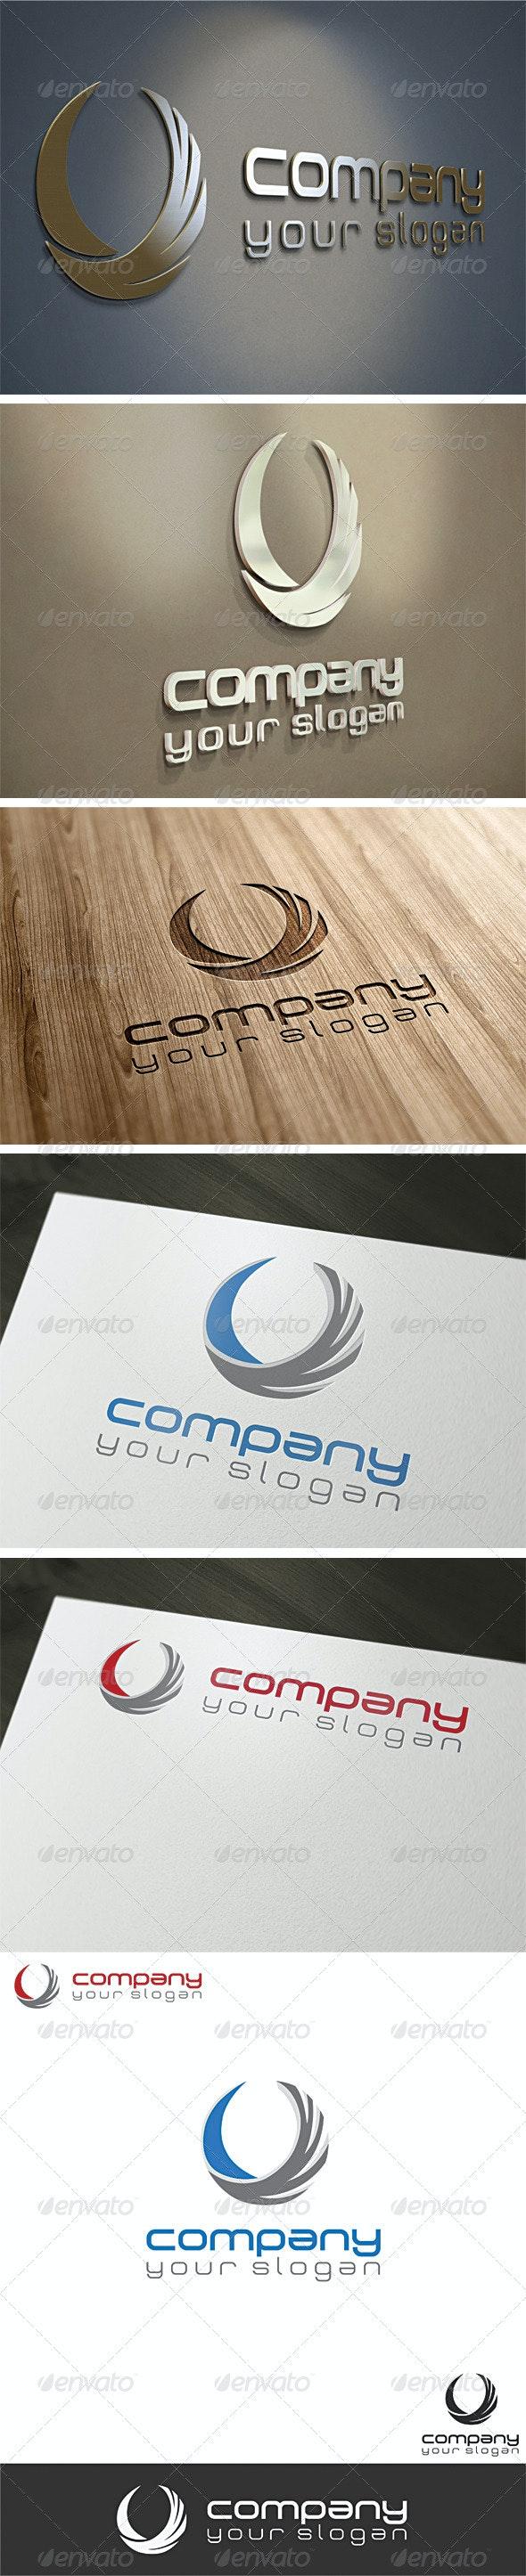 Agency Logo Template - Vector Abstract